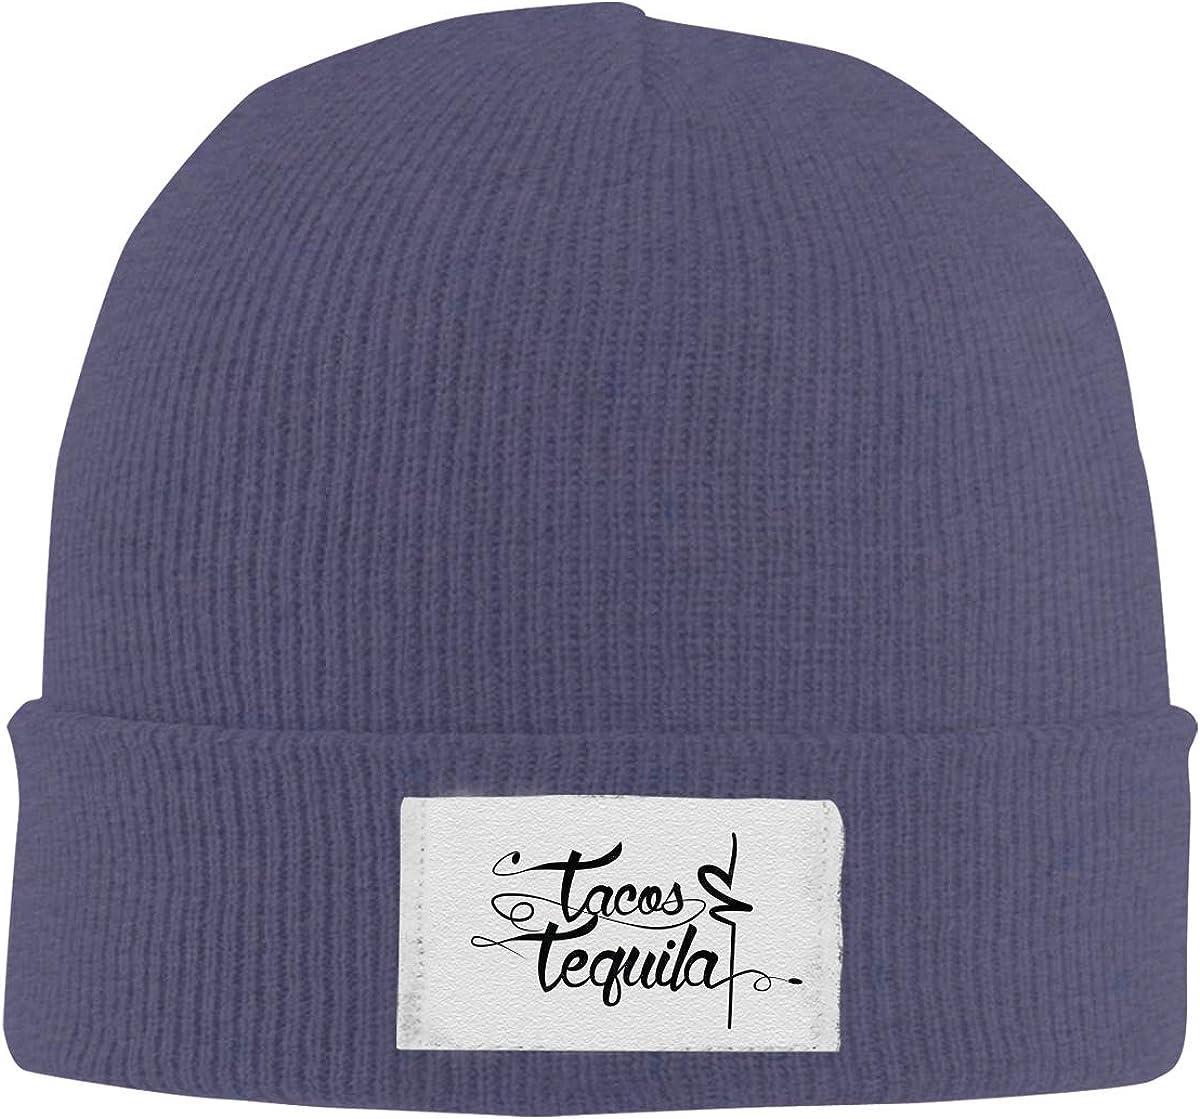 Dunpaiaa Skull Caps Pineapple Wear Glasses 1 Winter Warm Knit Hats Stretchy Cuff Beanie Hat Black